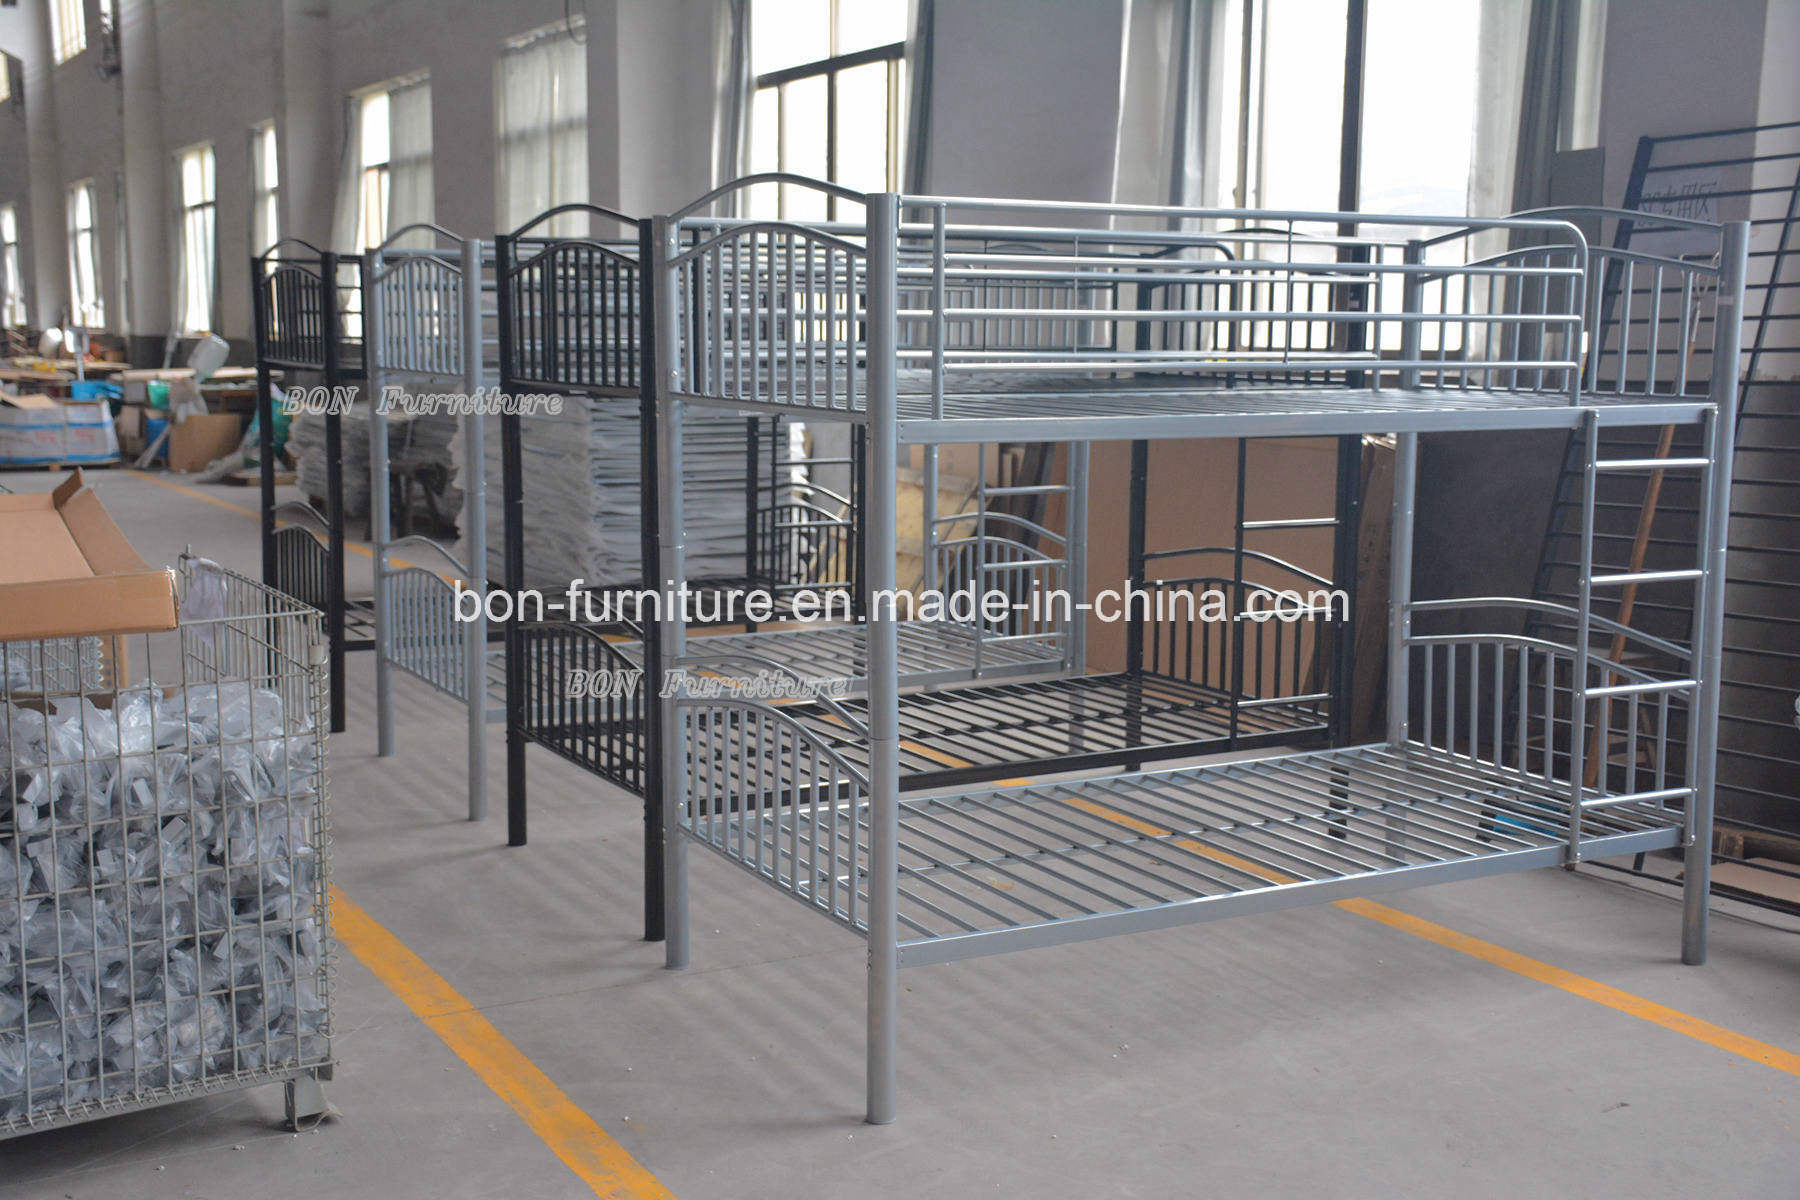 Enconomical Metal Bunk Bed